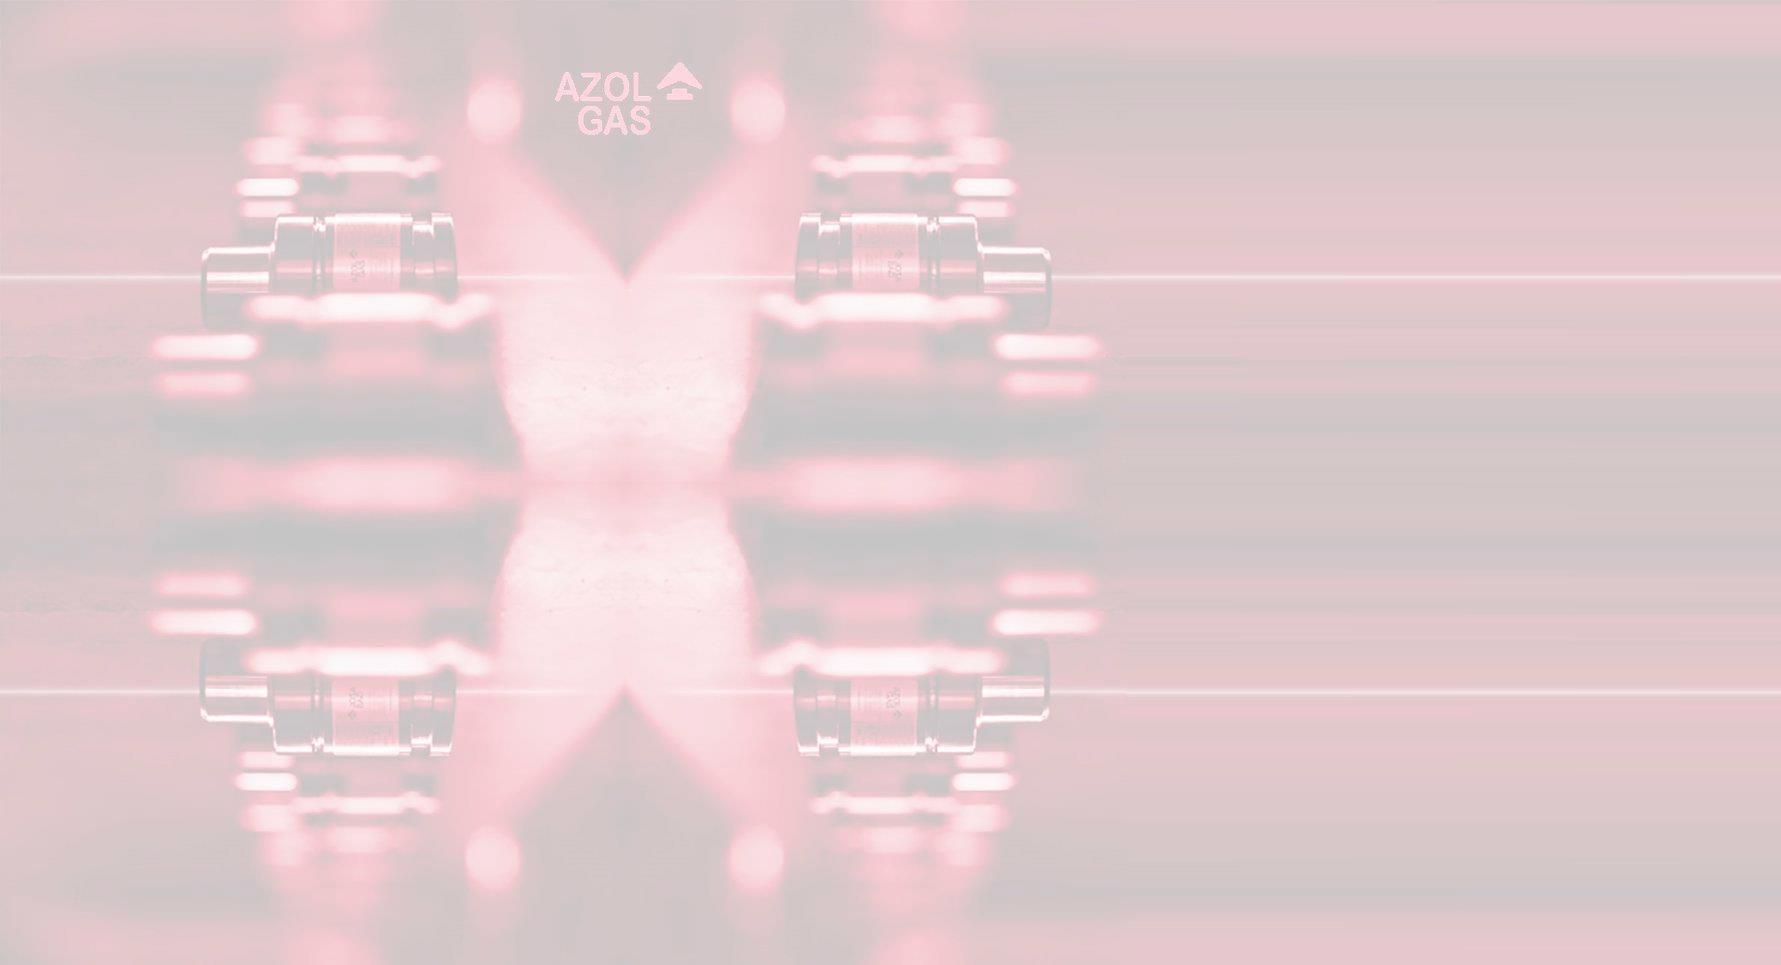 Updating AZOLGAS catalogues 2020